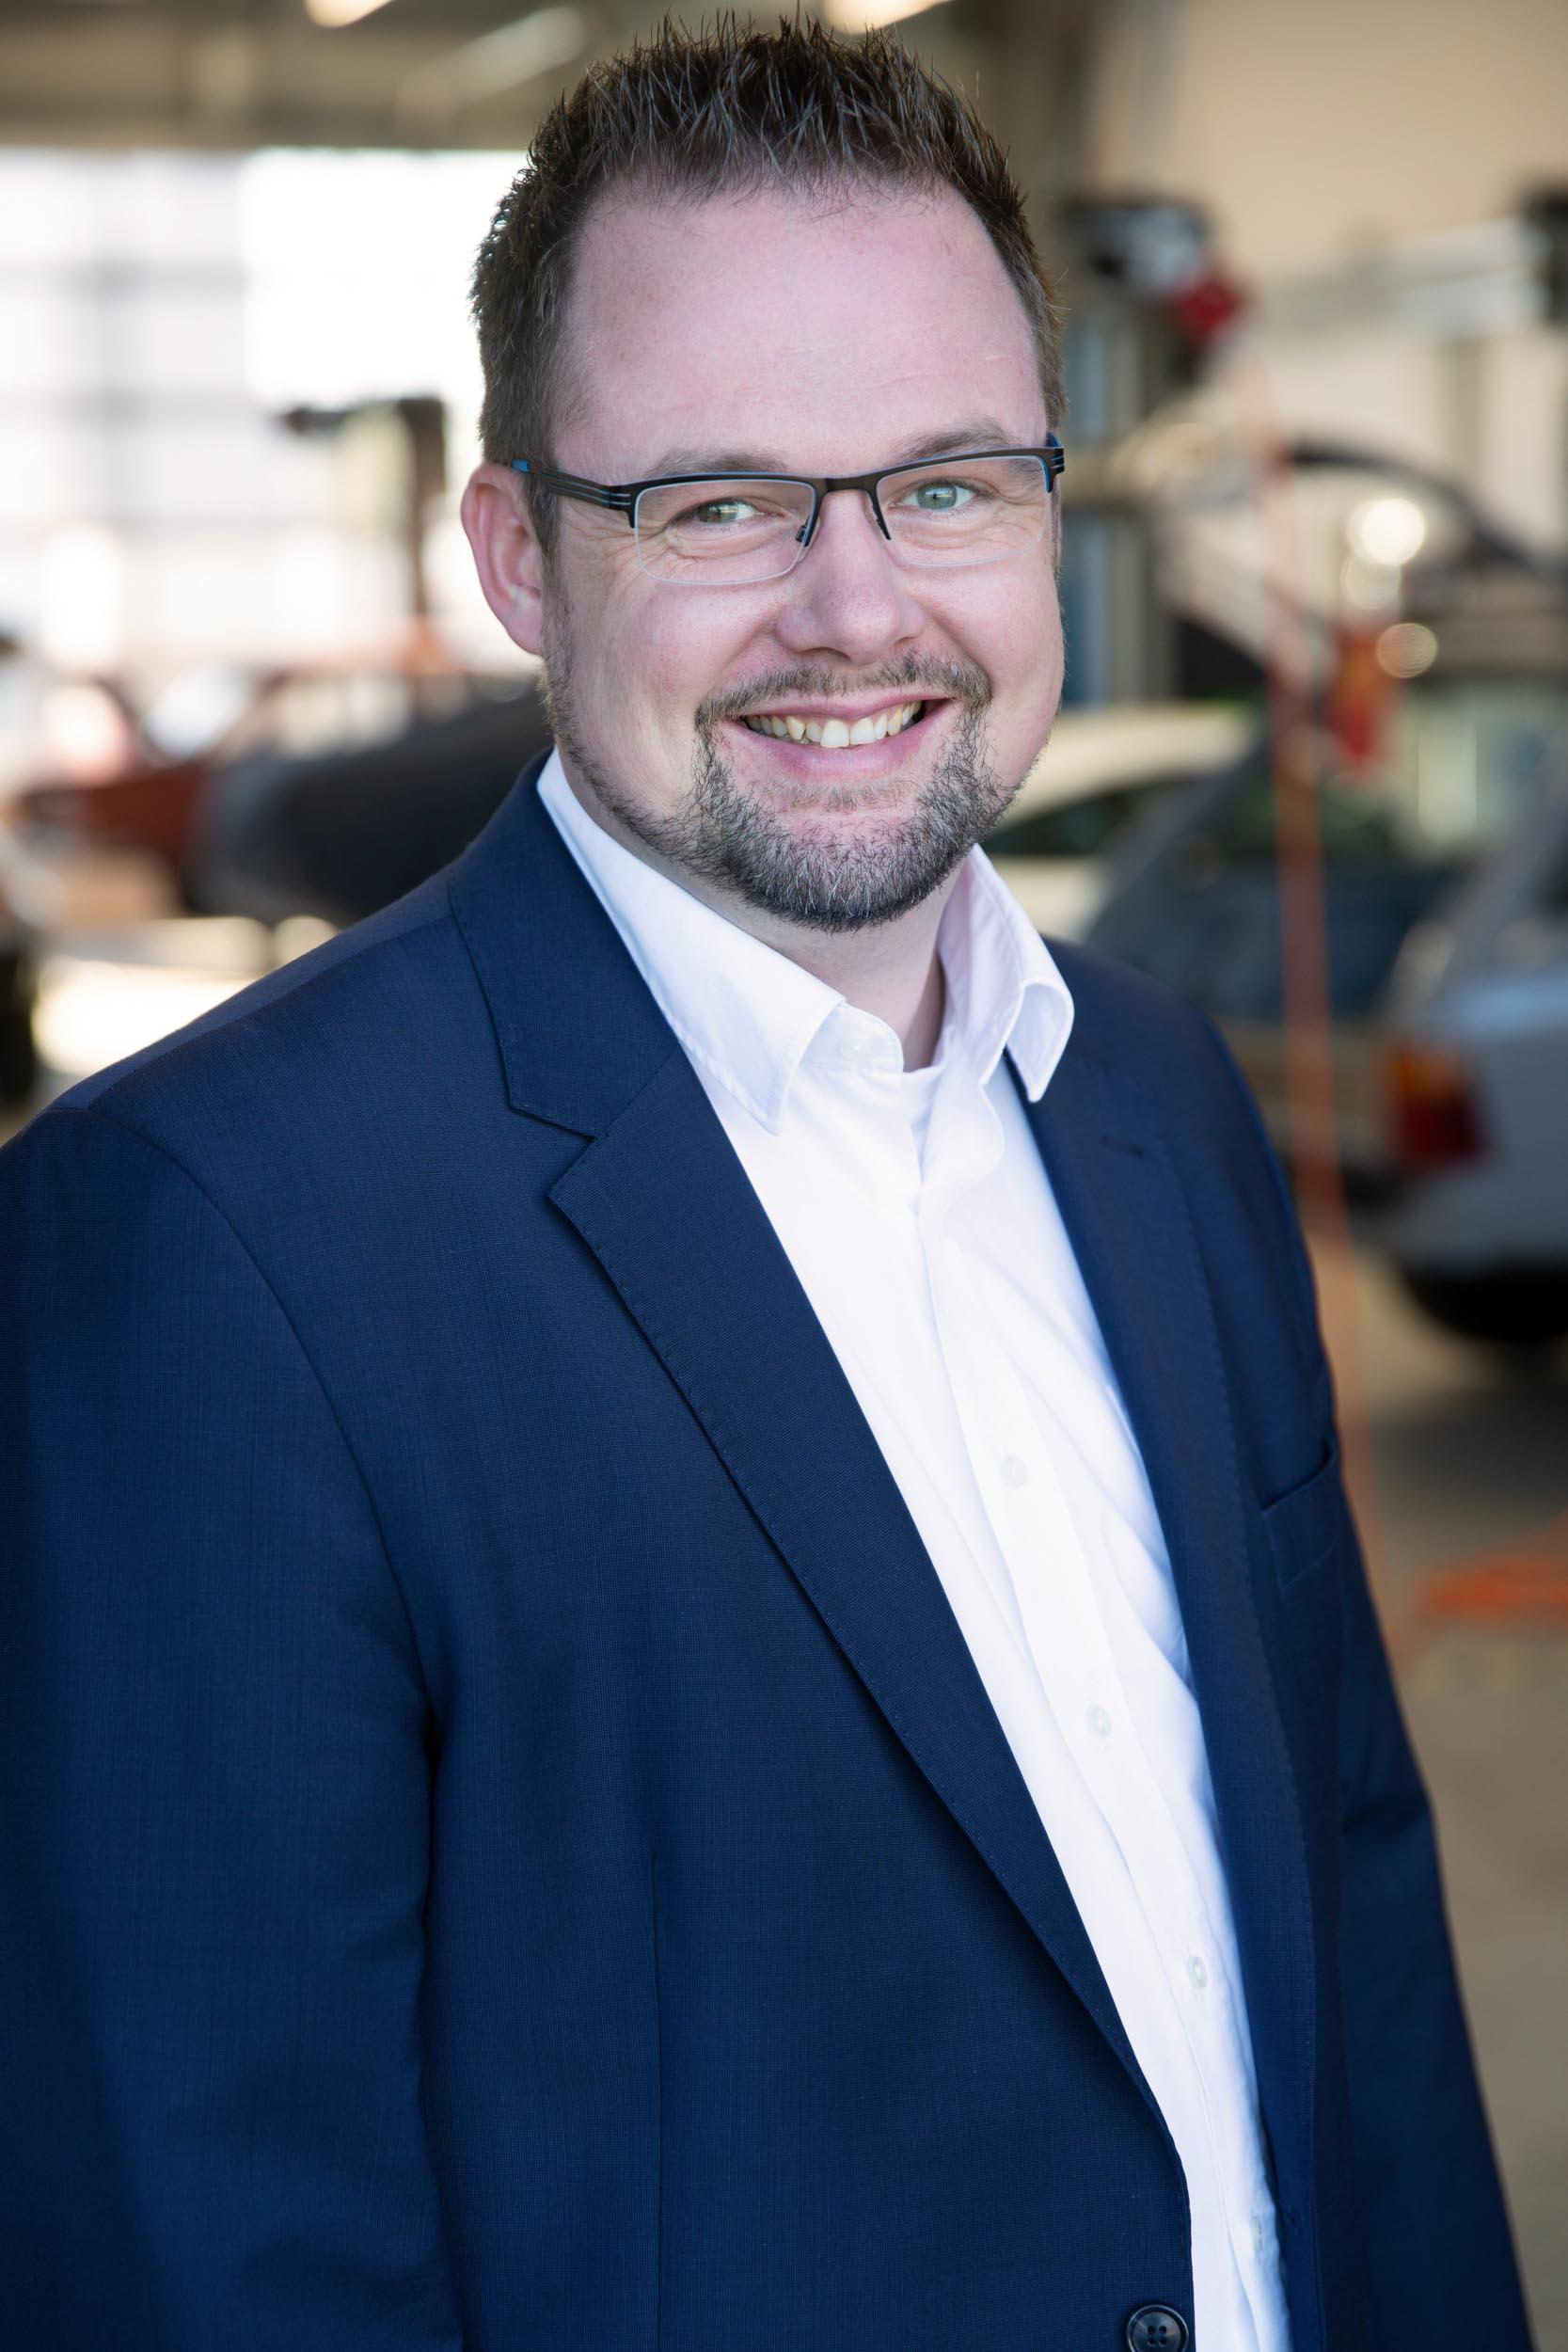 Philip Wagemann | Head of Project & Sales pwa@ecap-mobility.com